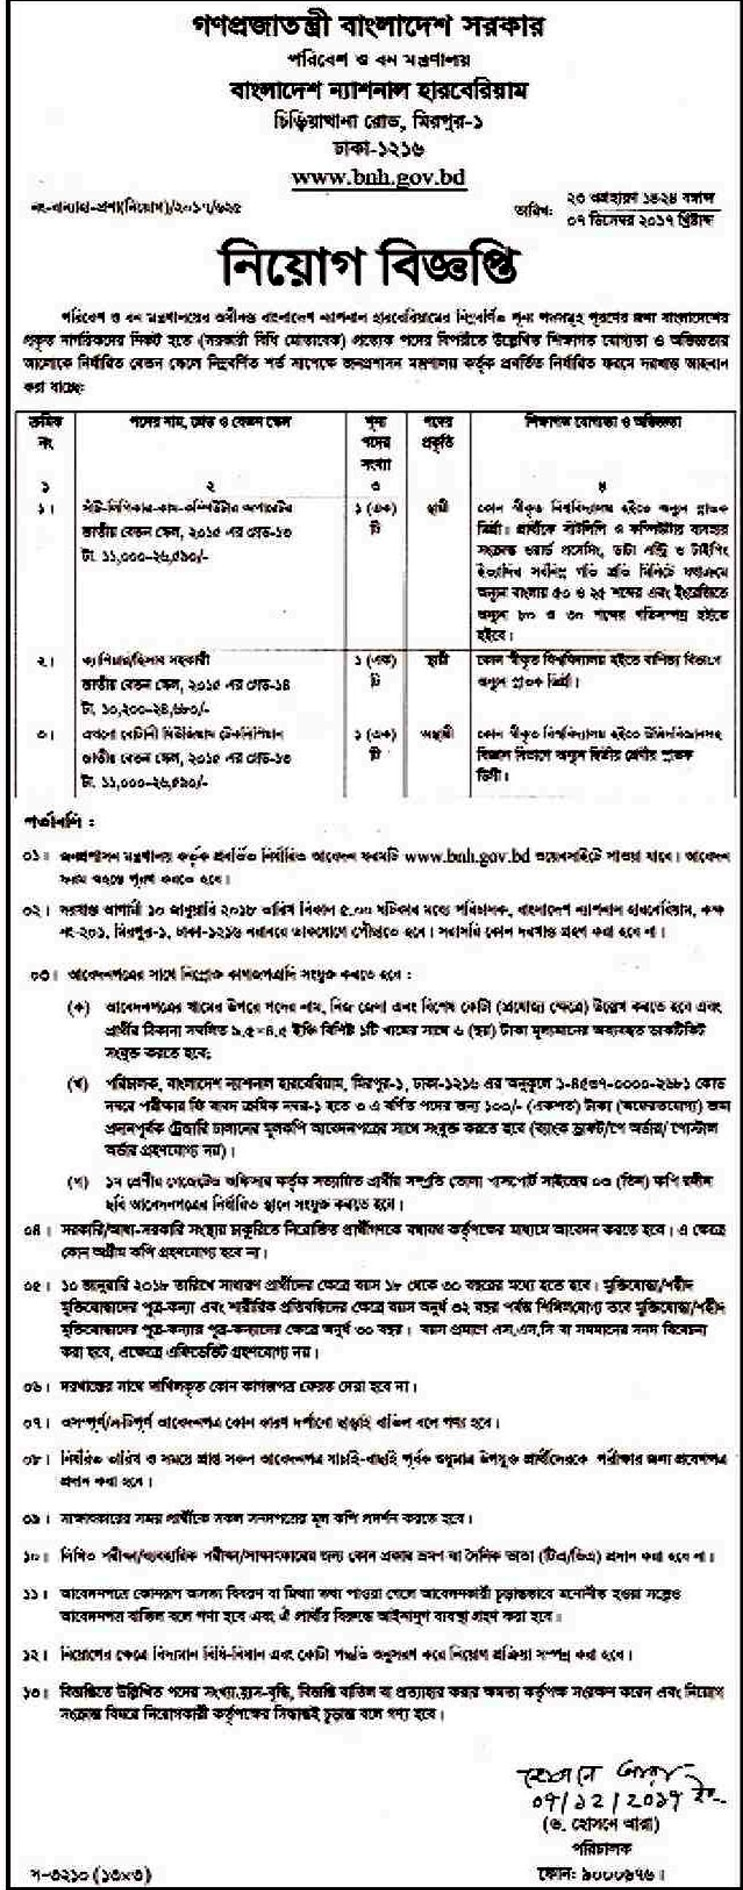 Environment and Forests Ministry Job Circular 2017